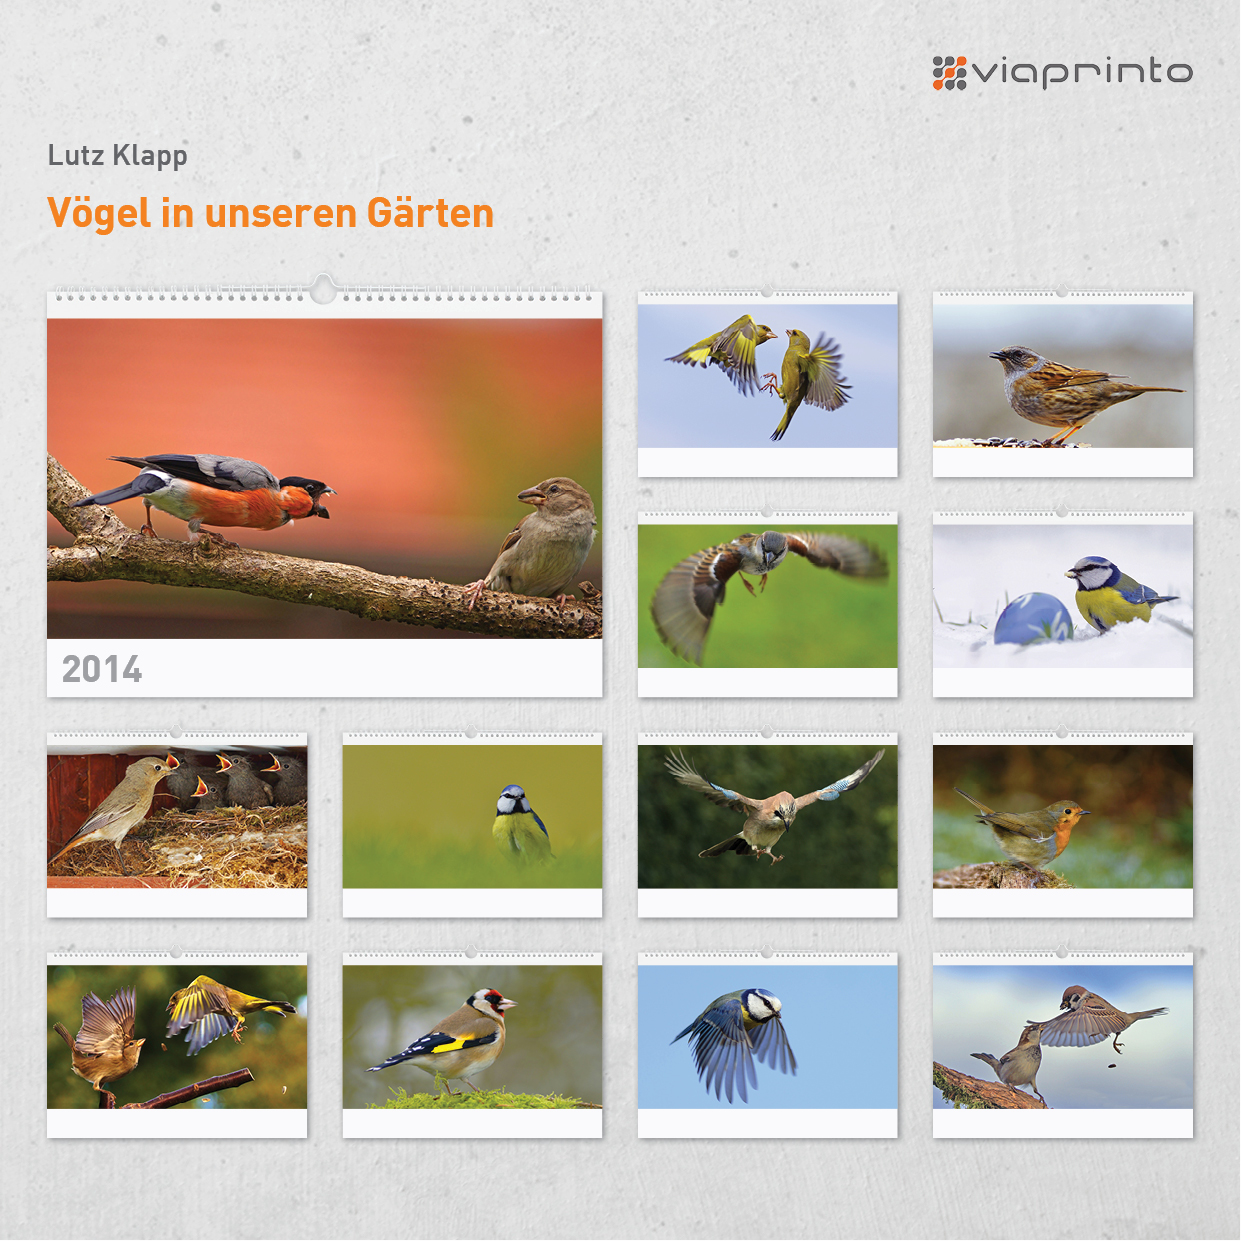 https://www.viaprinto.de/motivkalender#/voegel_in_unseren_gaerten